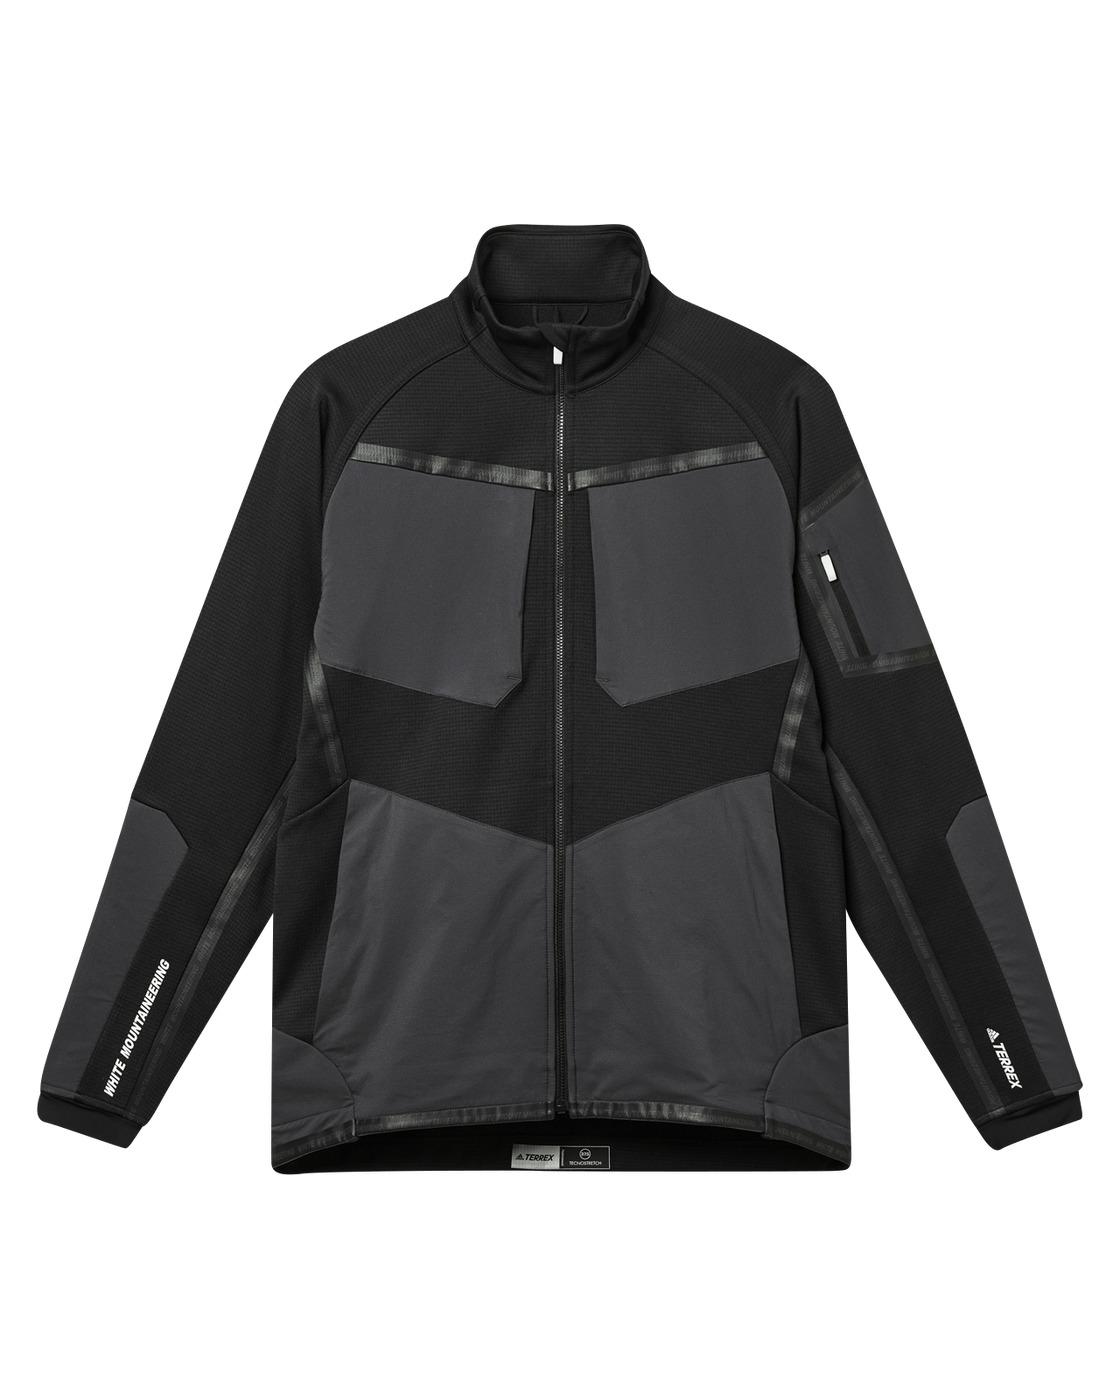 Adidas Originals Adidas X White Mountaineering Stockhorn Jacket Black